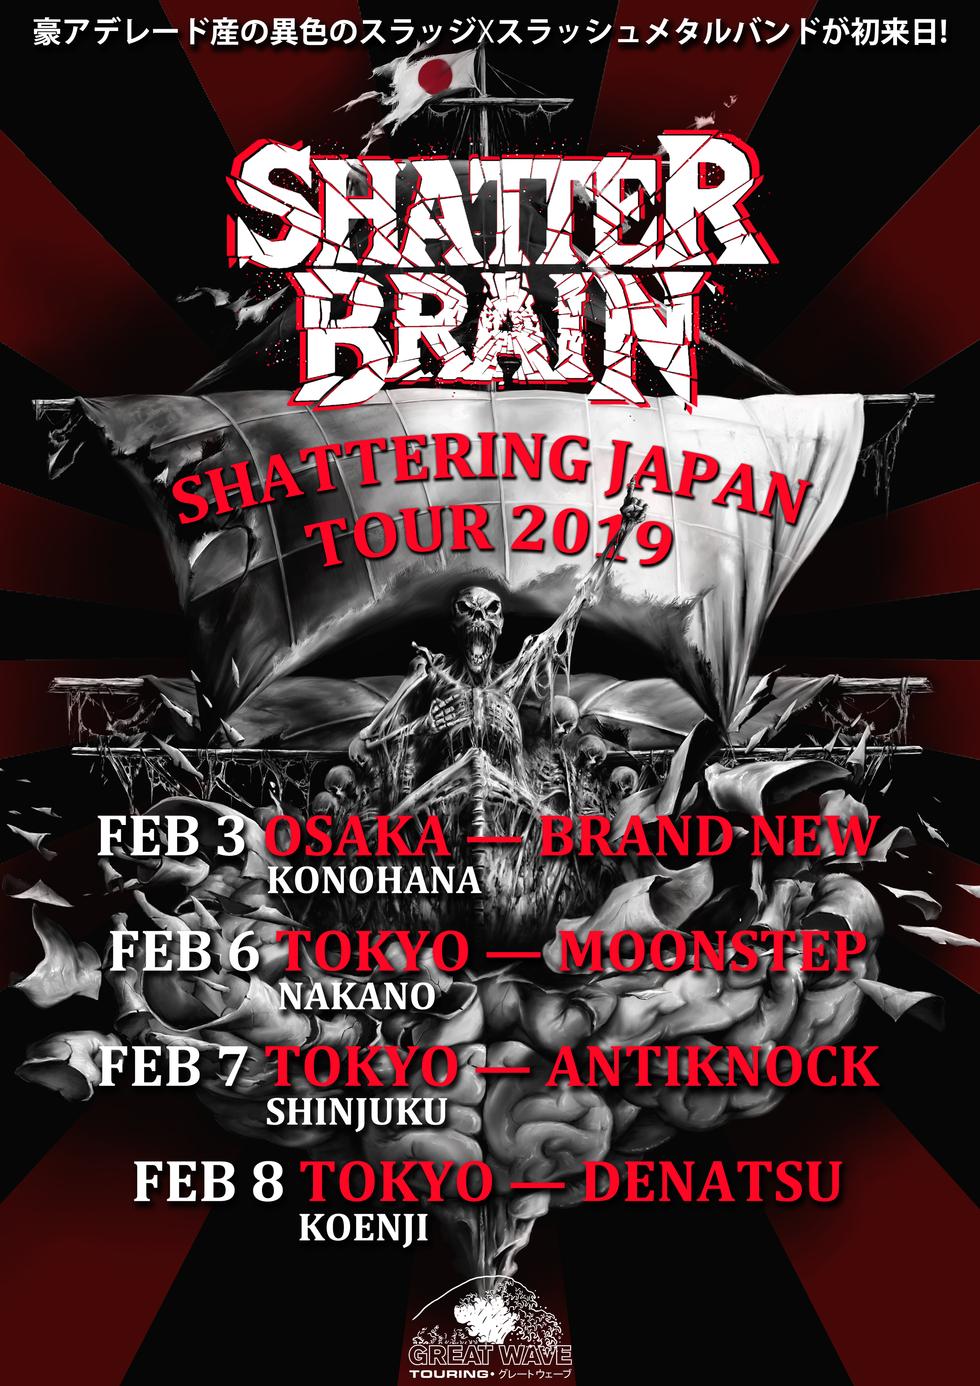 SHATTER BRAIN ANNOUNCE JAPAN TOUR